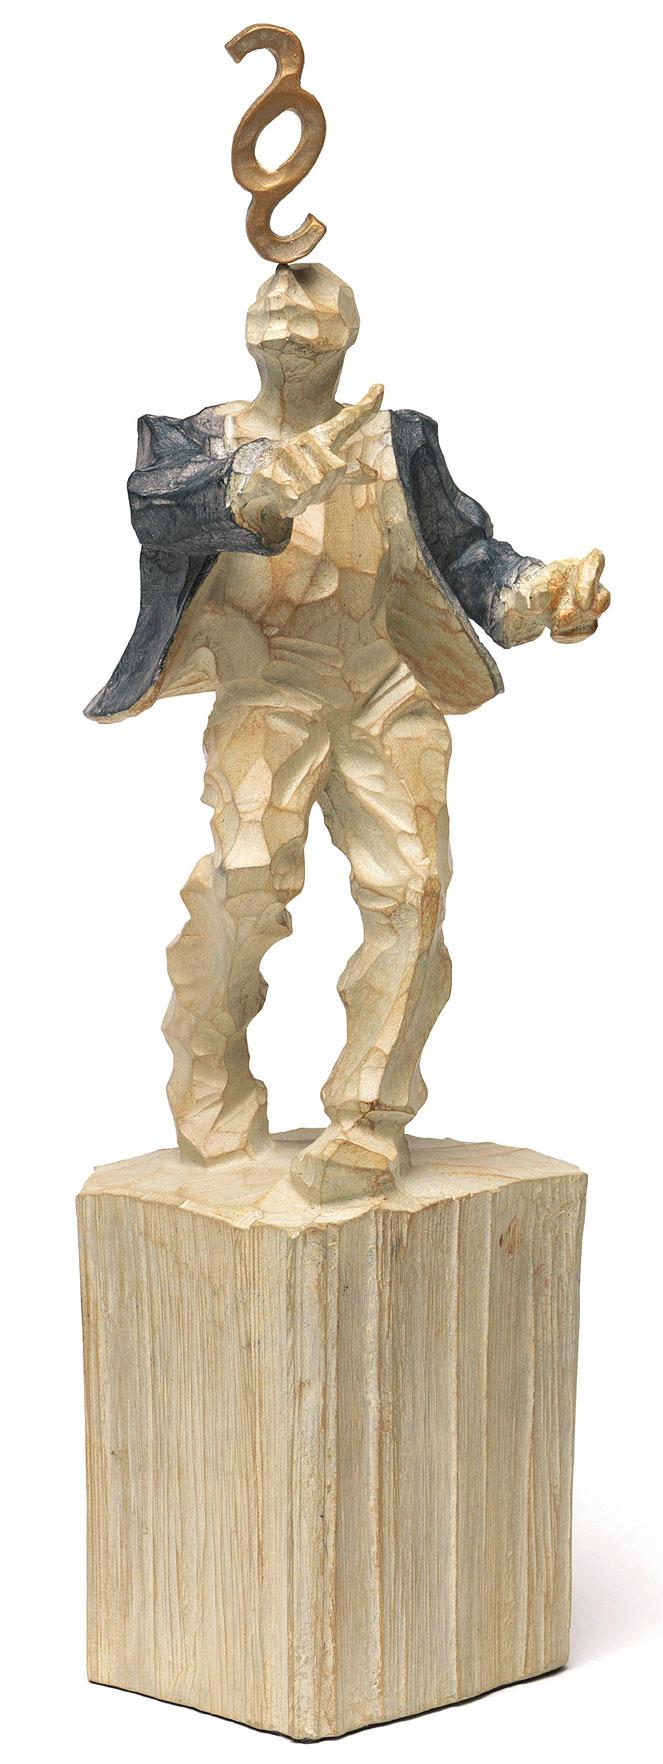 "Skulptur ""Jurist"", Kunstguss Holzfinish"